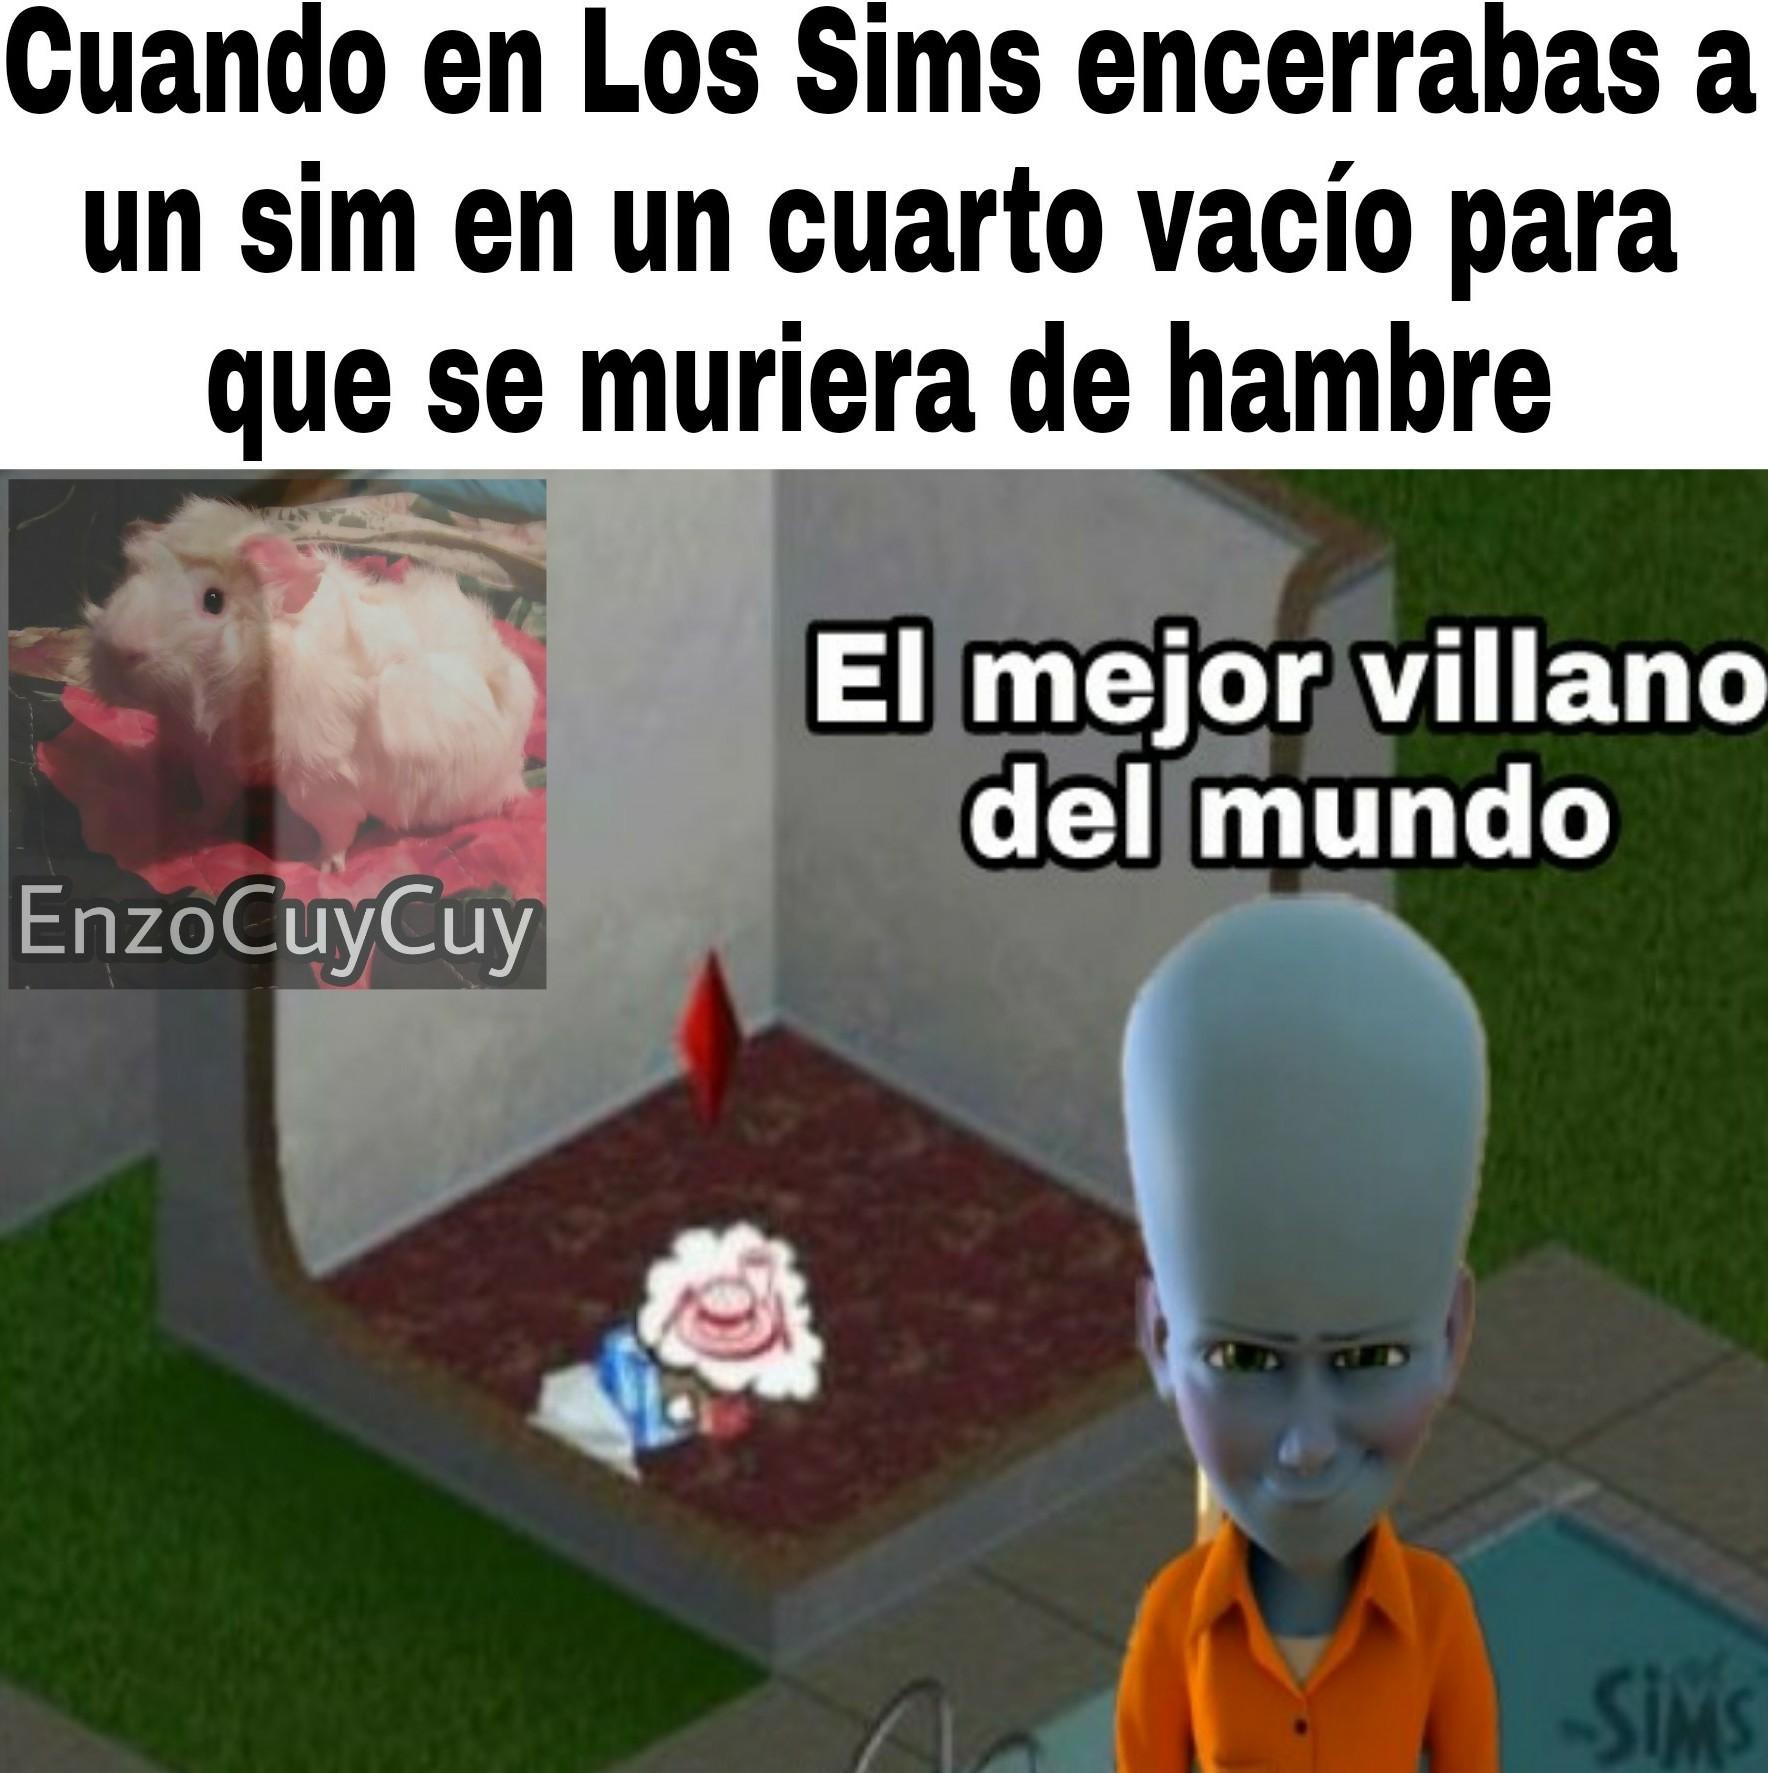 Cuanta crueldad :0 - meme